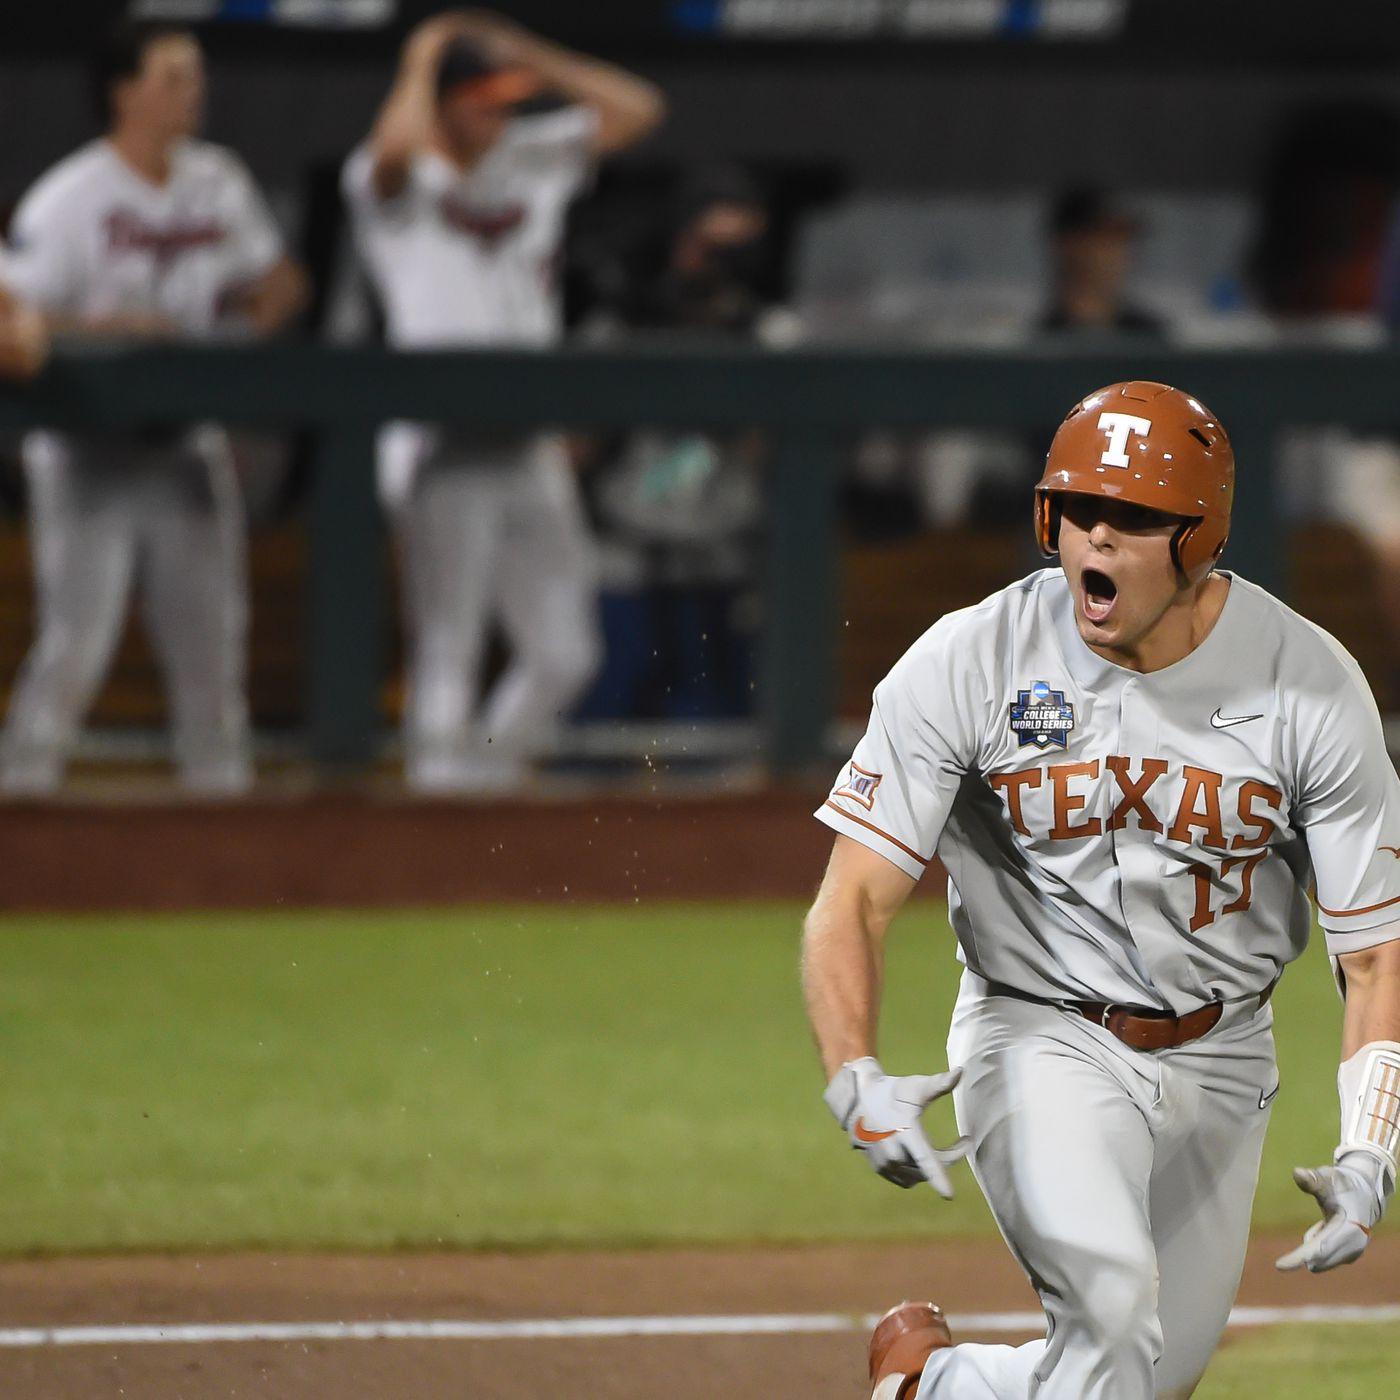 Texas In A Rain Delay After Ivan Melendez Home Run Burnt Orange Nation